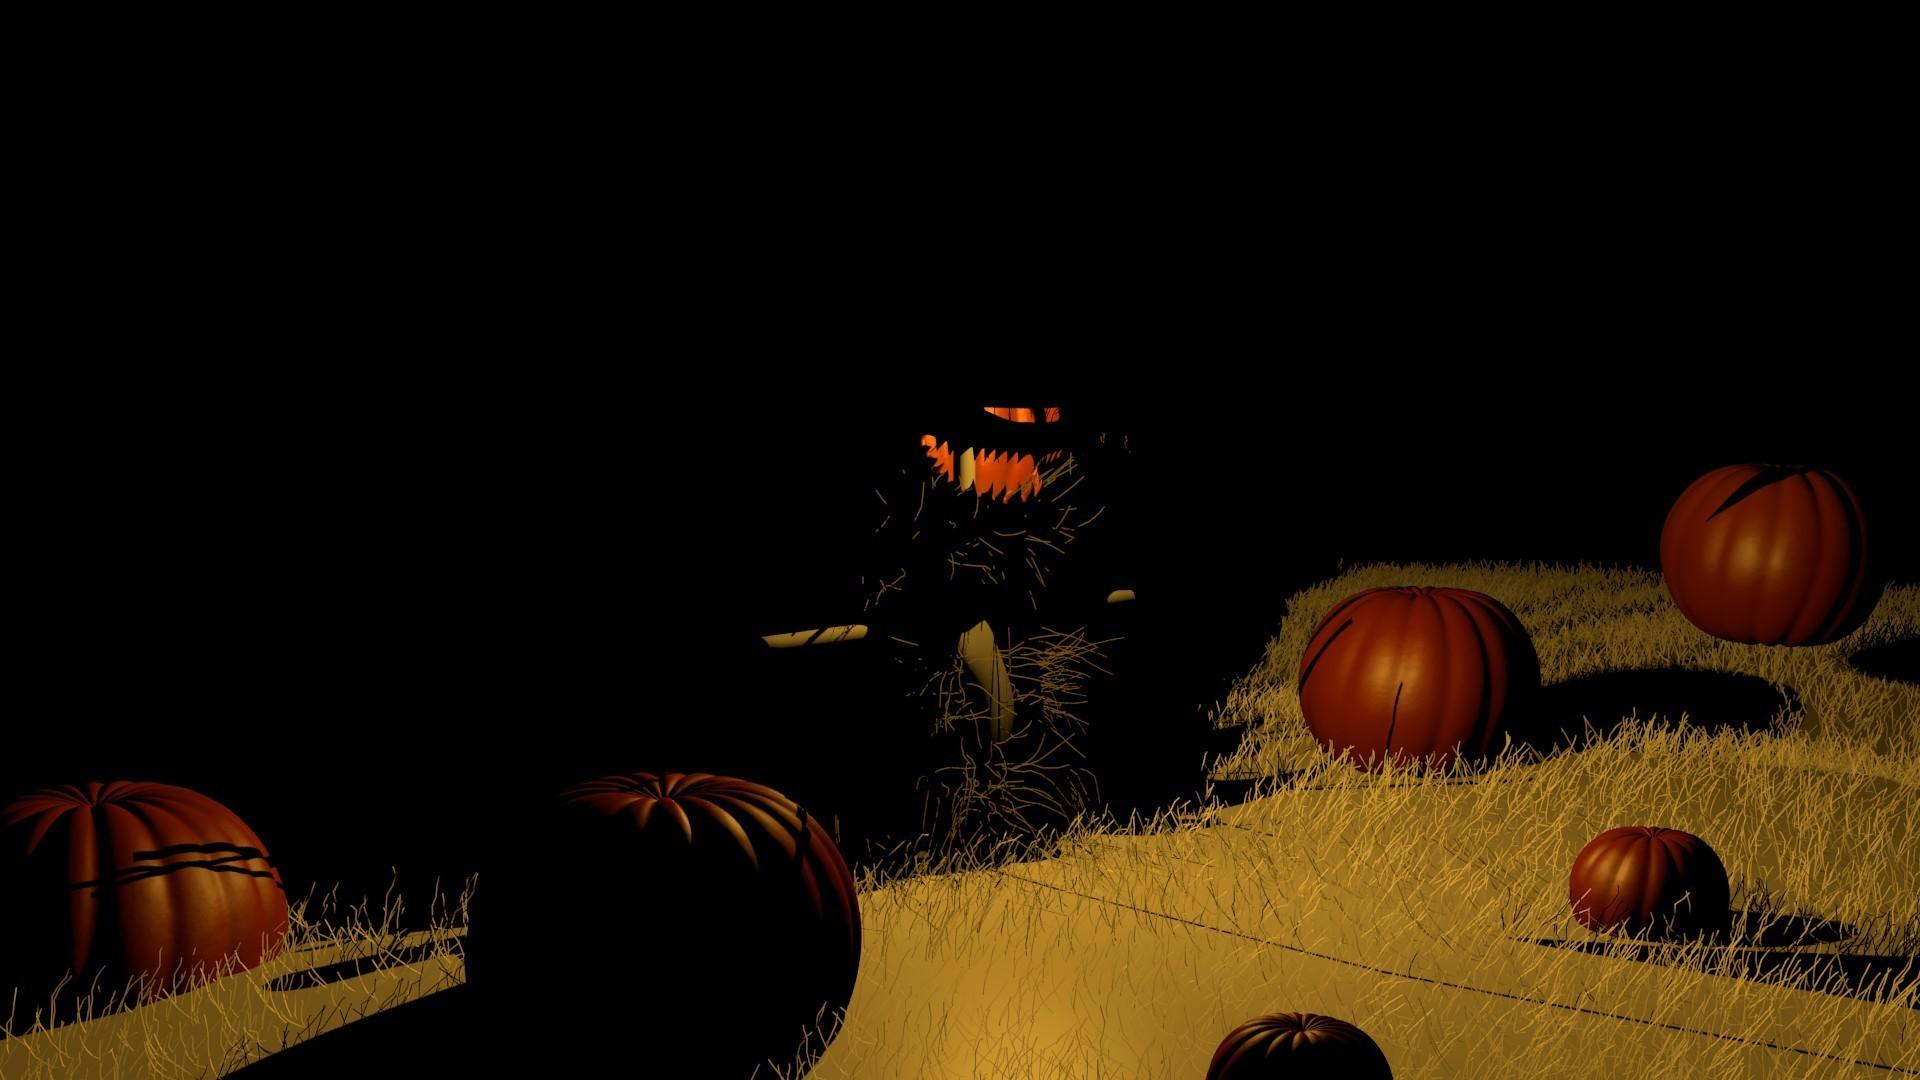 Pumpkin Tag – Pumpkin Pumpkins Halloween Patch Scarecrow Dual Monitor  Background for HD 16:9